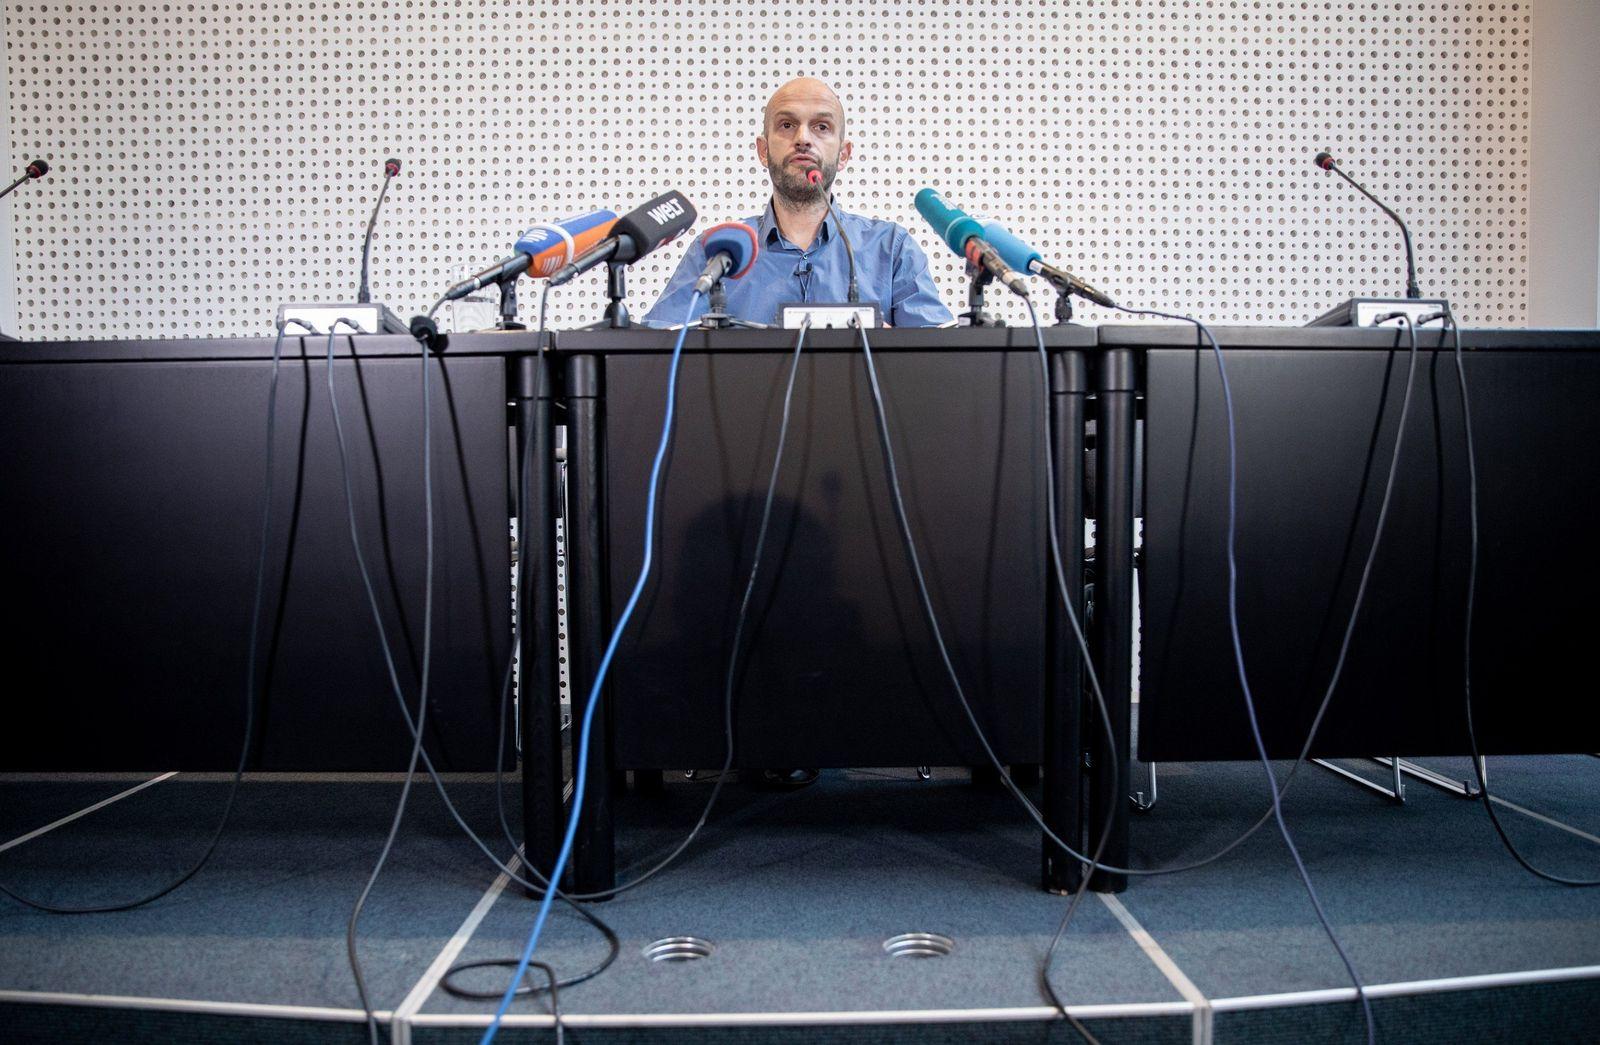 SPD-Abgeordneter Bülow tritt aus Partei aus